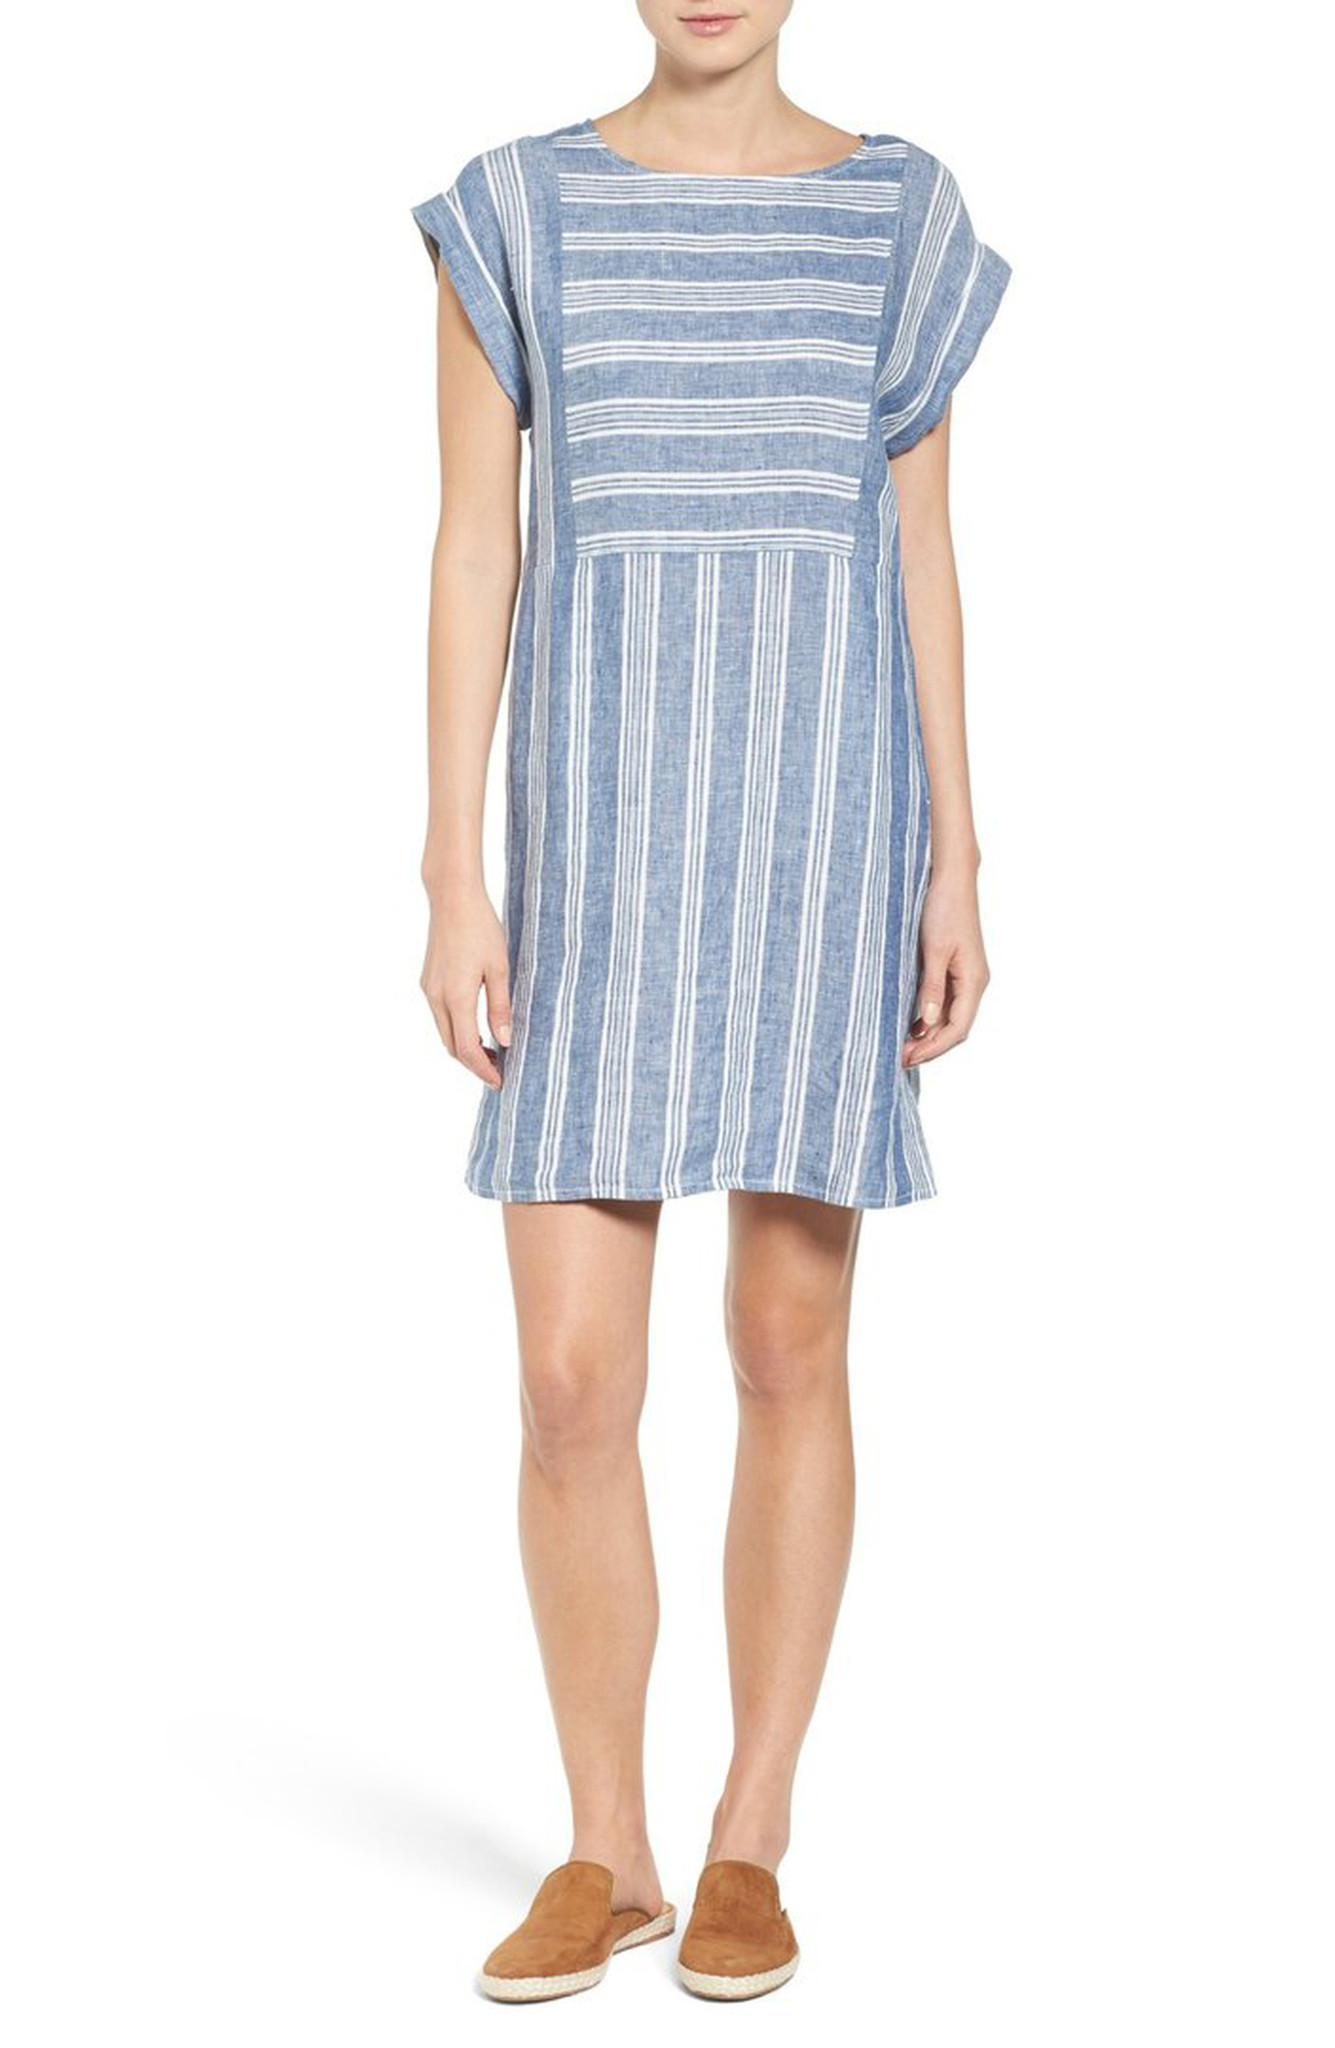 99e6a4cd96038 Beach attire: Beach fashions to suit every body, style - Baltimore Sun